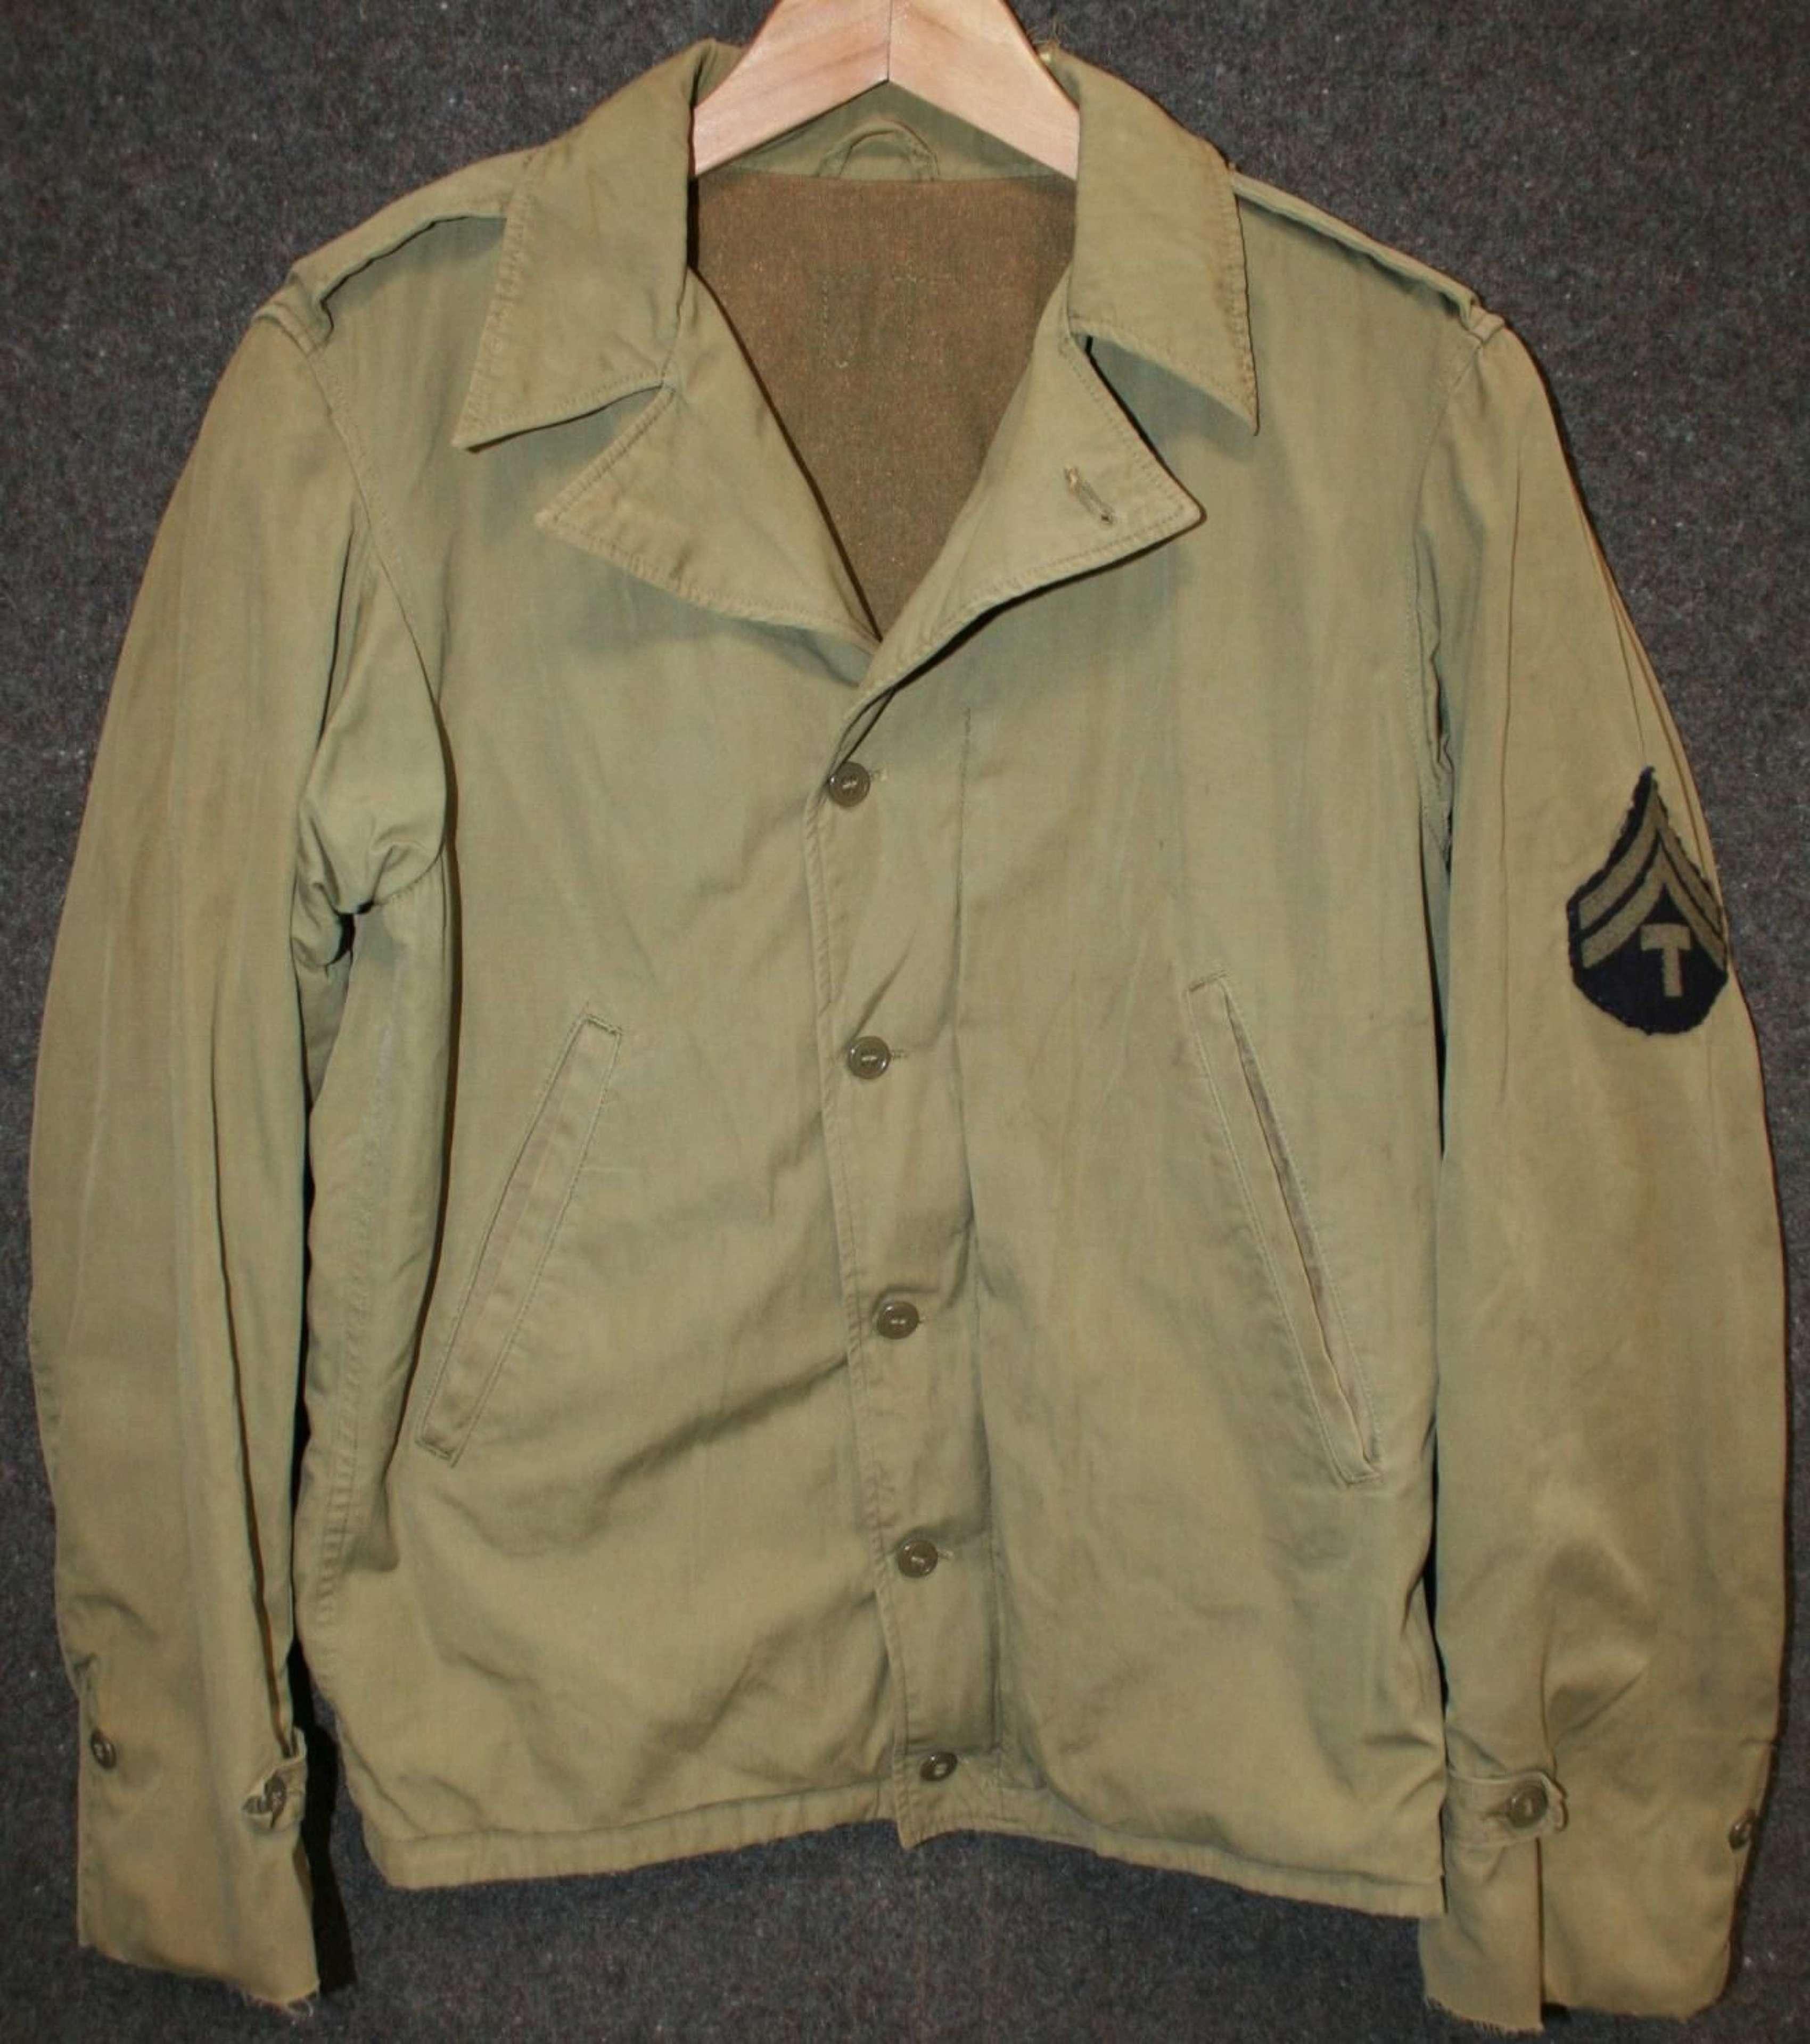 A WWII US ARMY M1941 JACKET